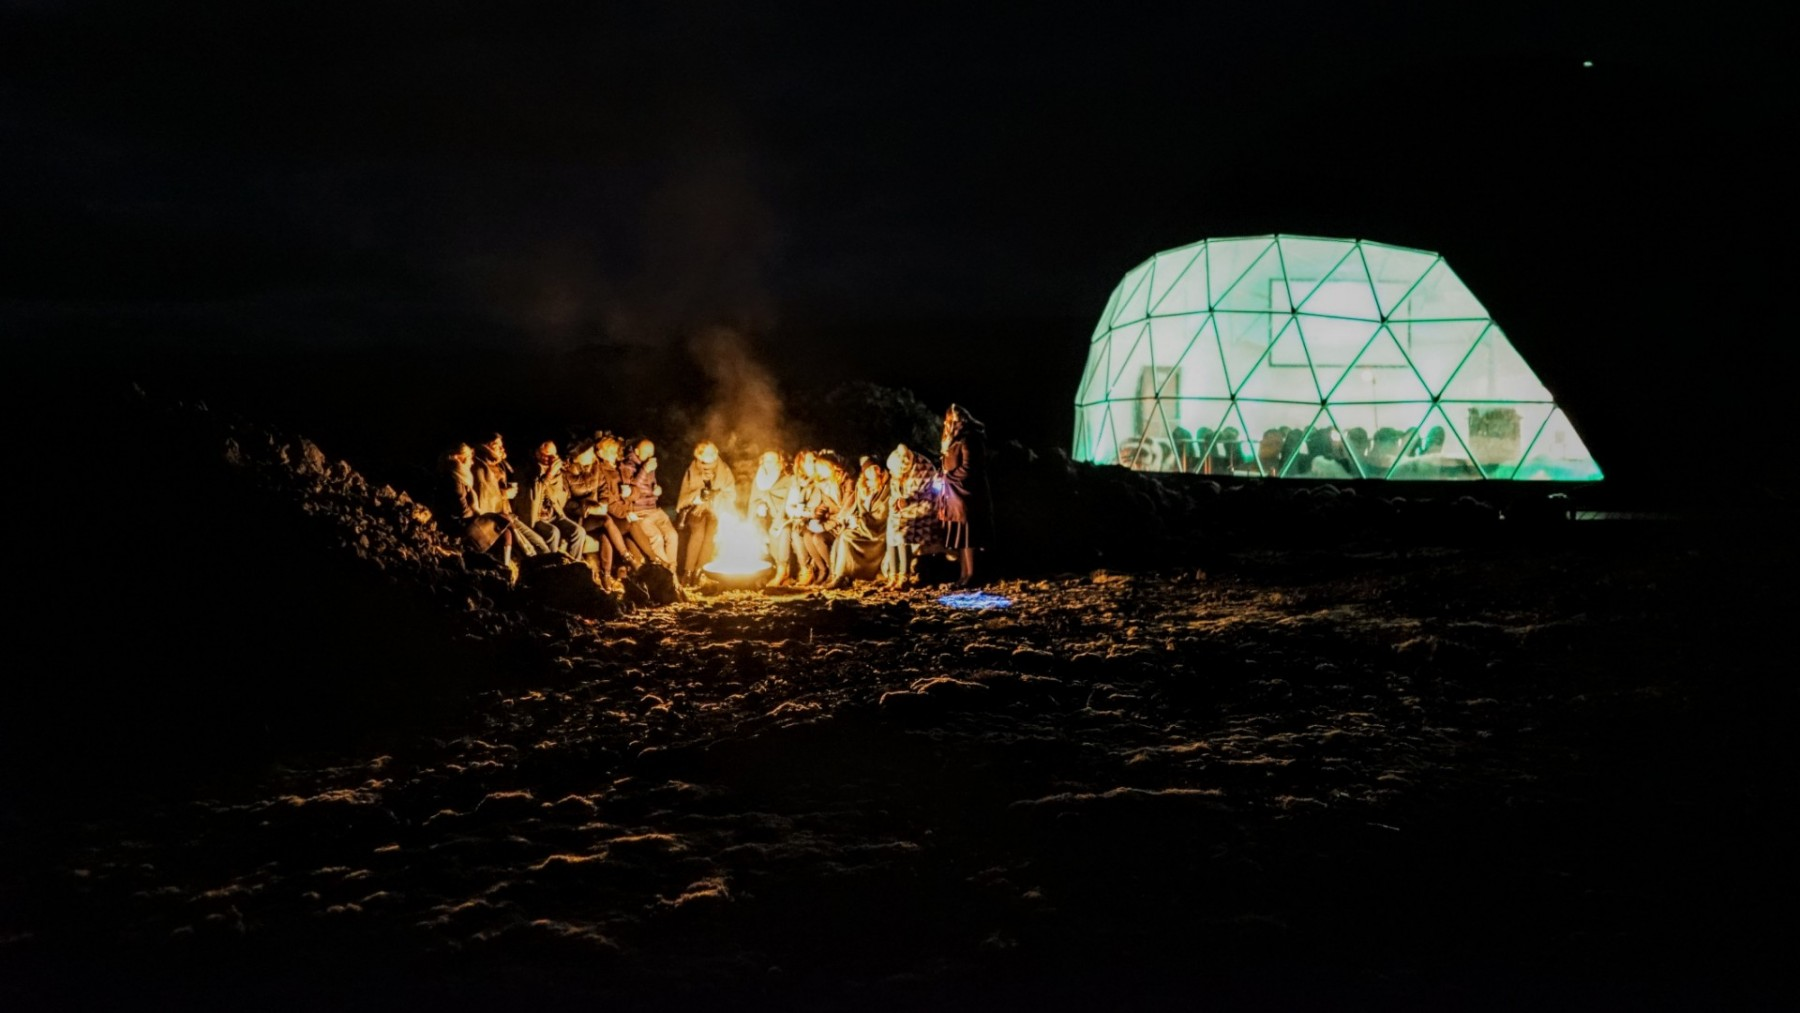 dive-website-aurora-basecamp-events-fire.jpg